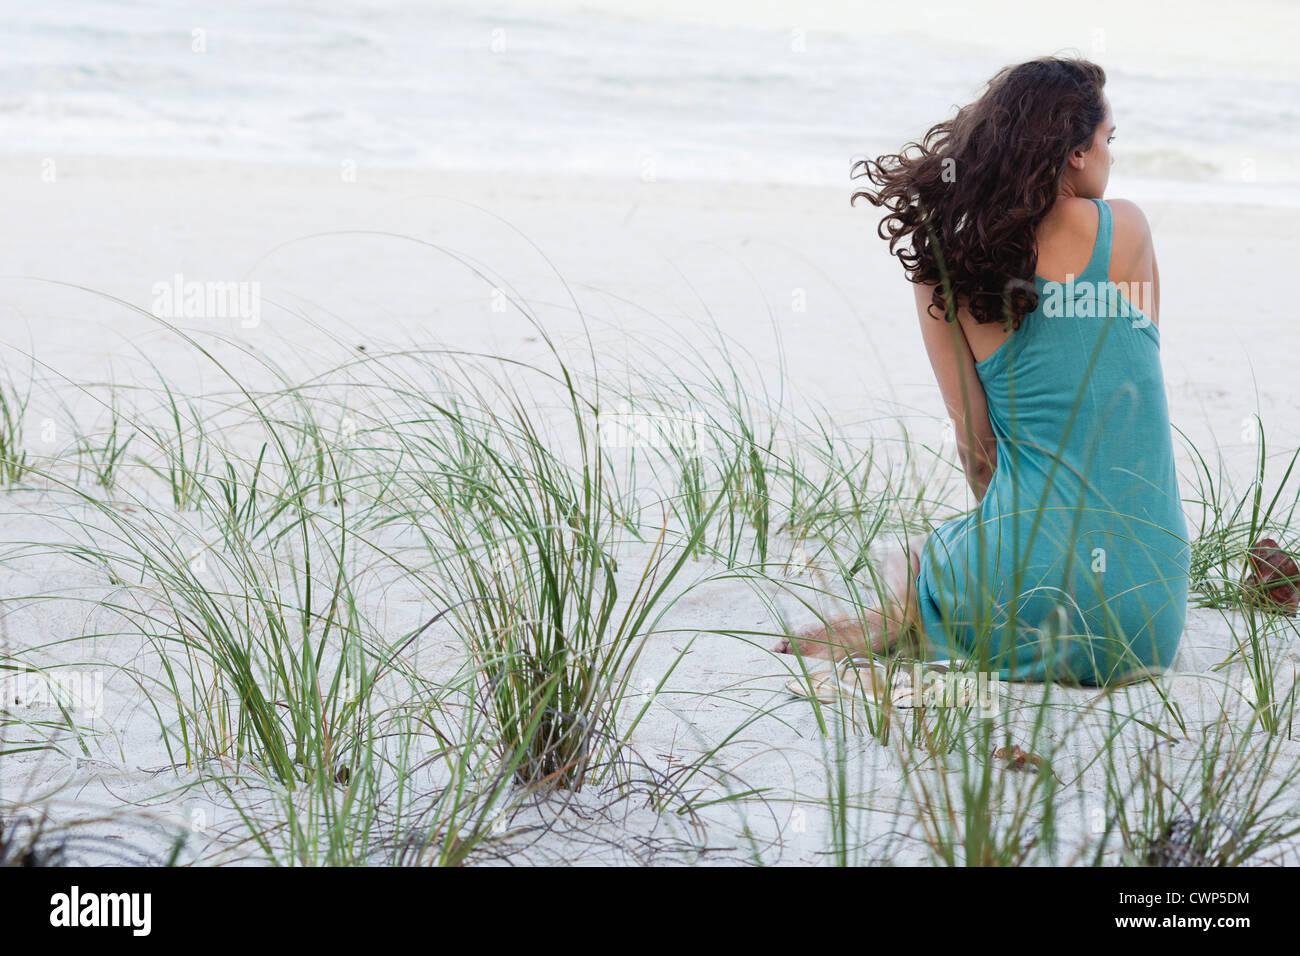 Teenage girl sitting on beach, rear view - Stock Image